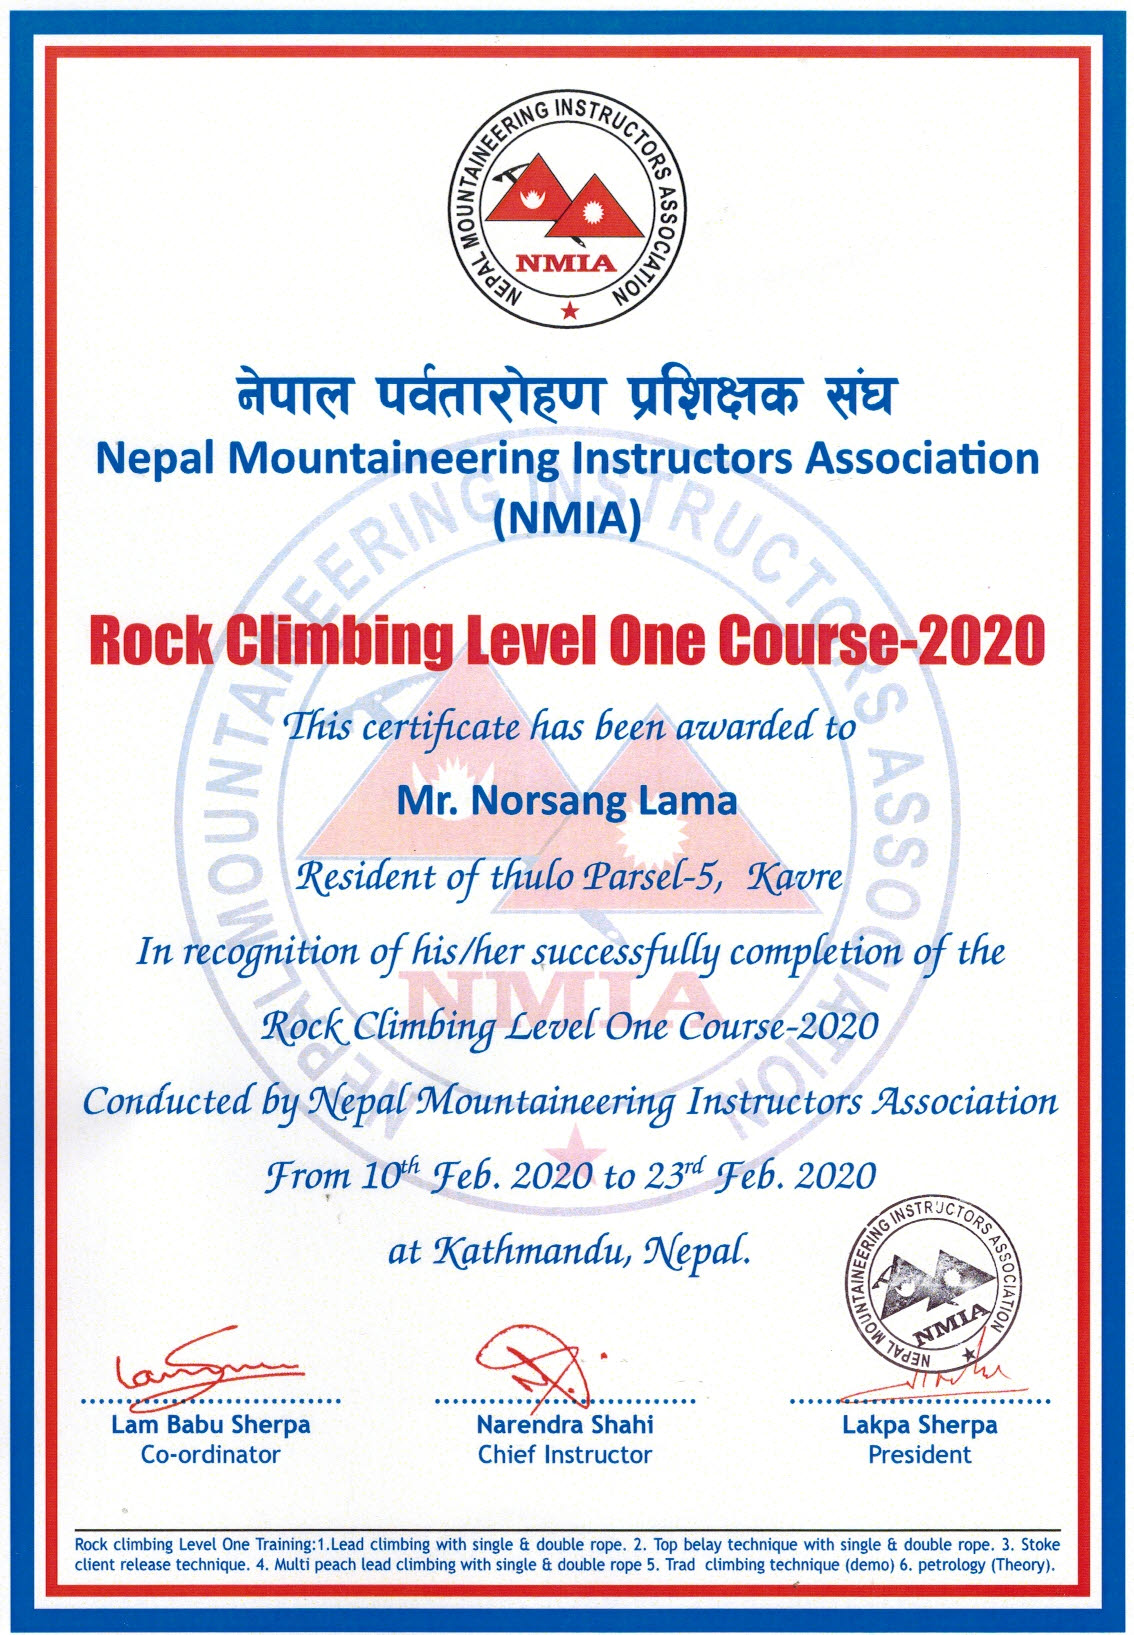 Advance Rock Climbing Course